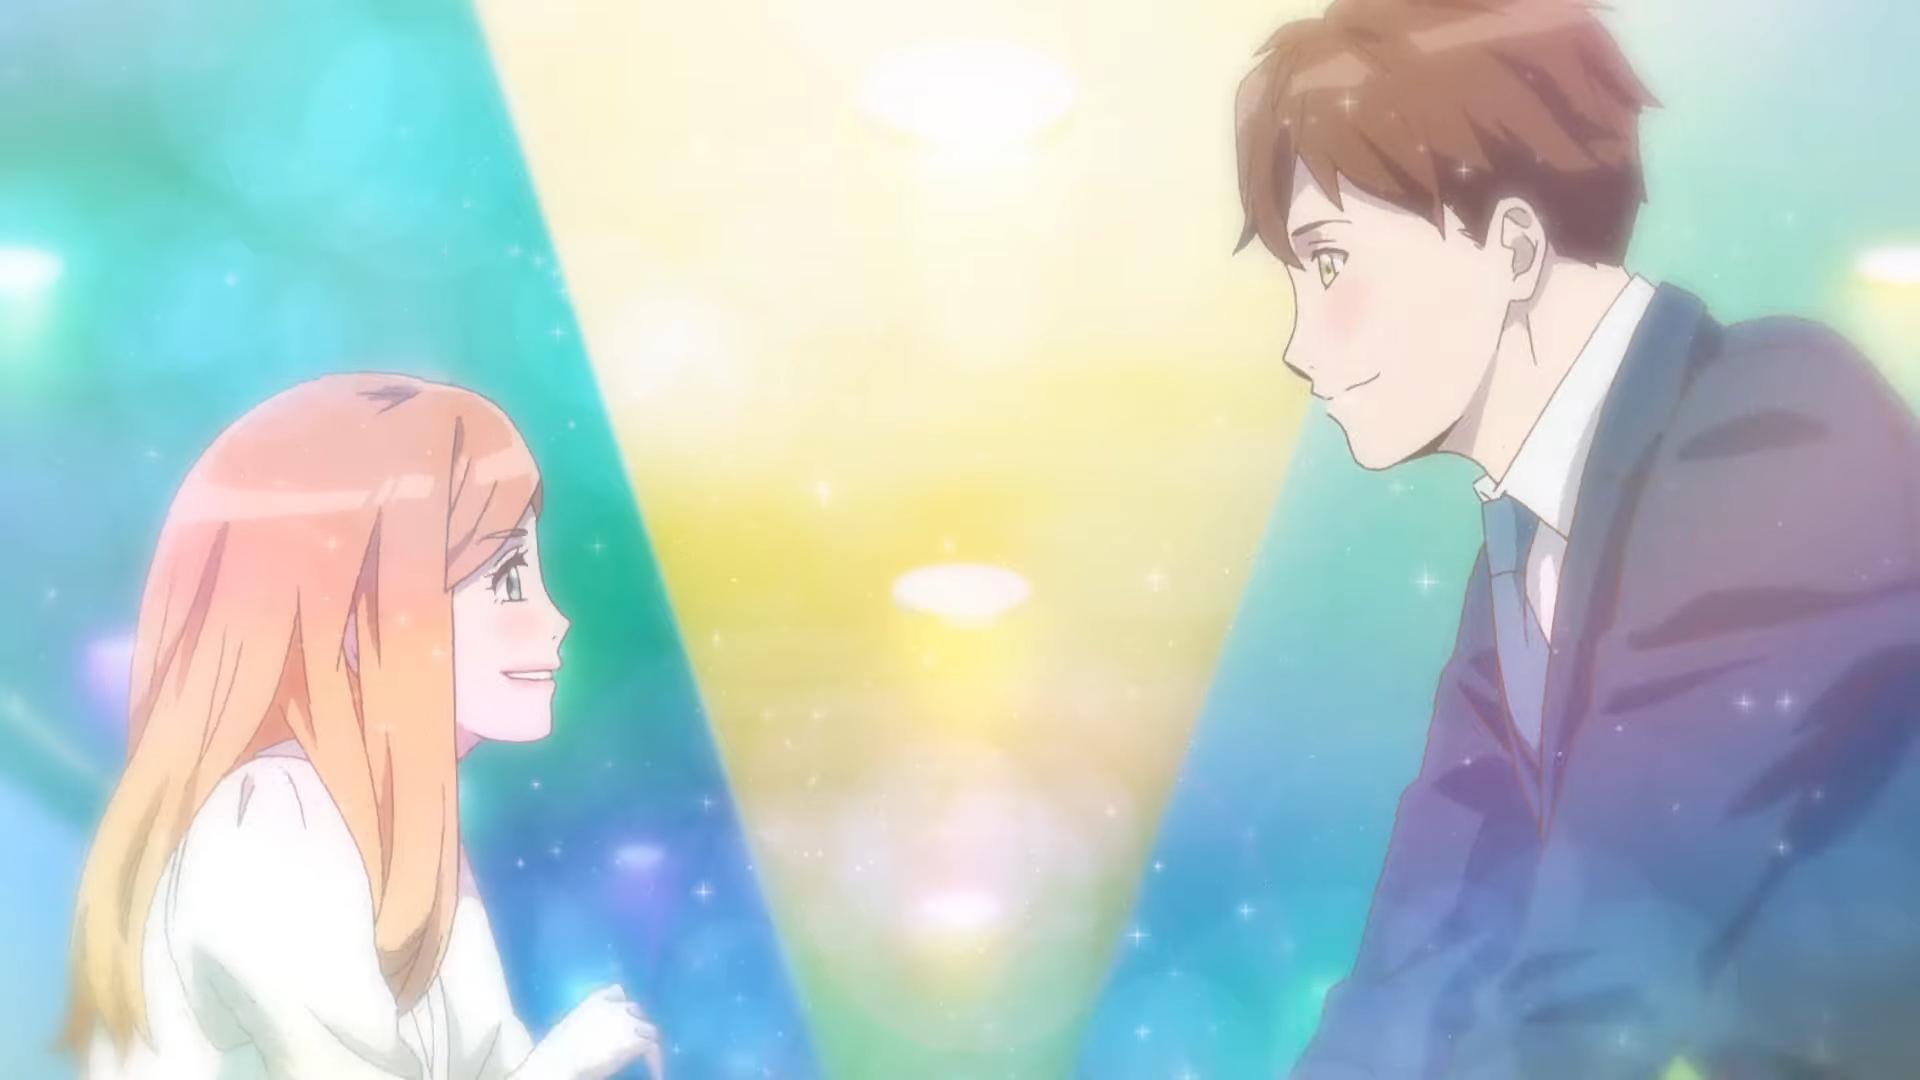 Mitsuki and Ryota